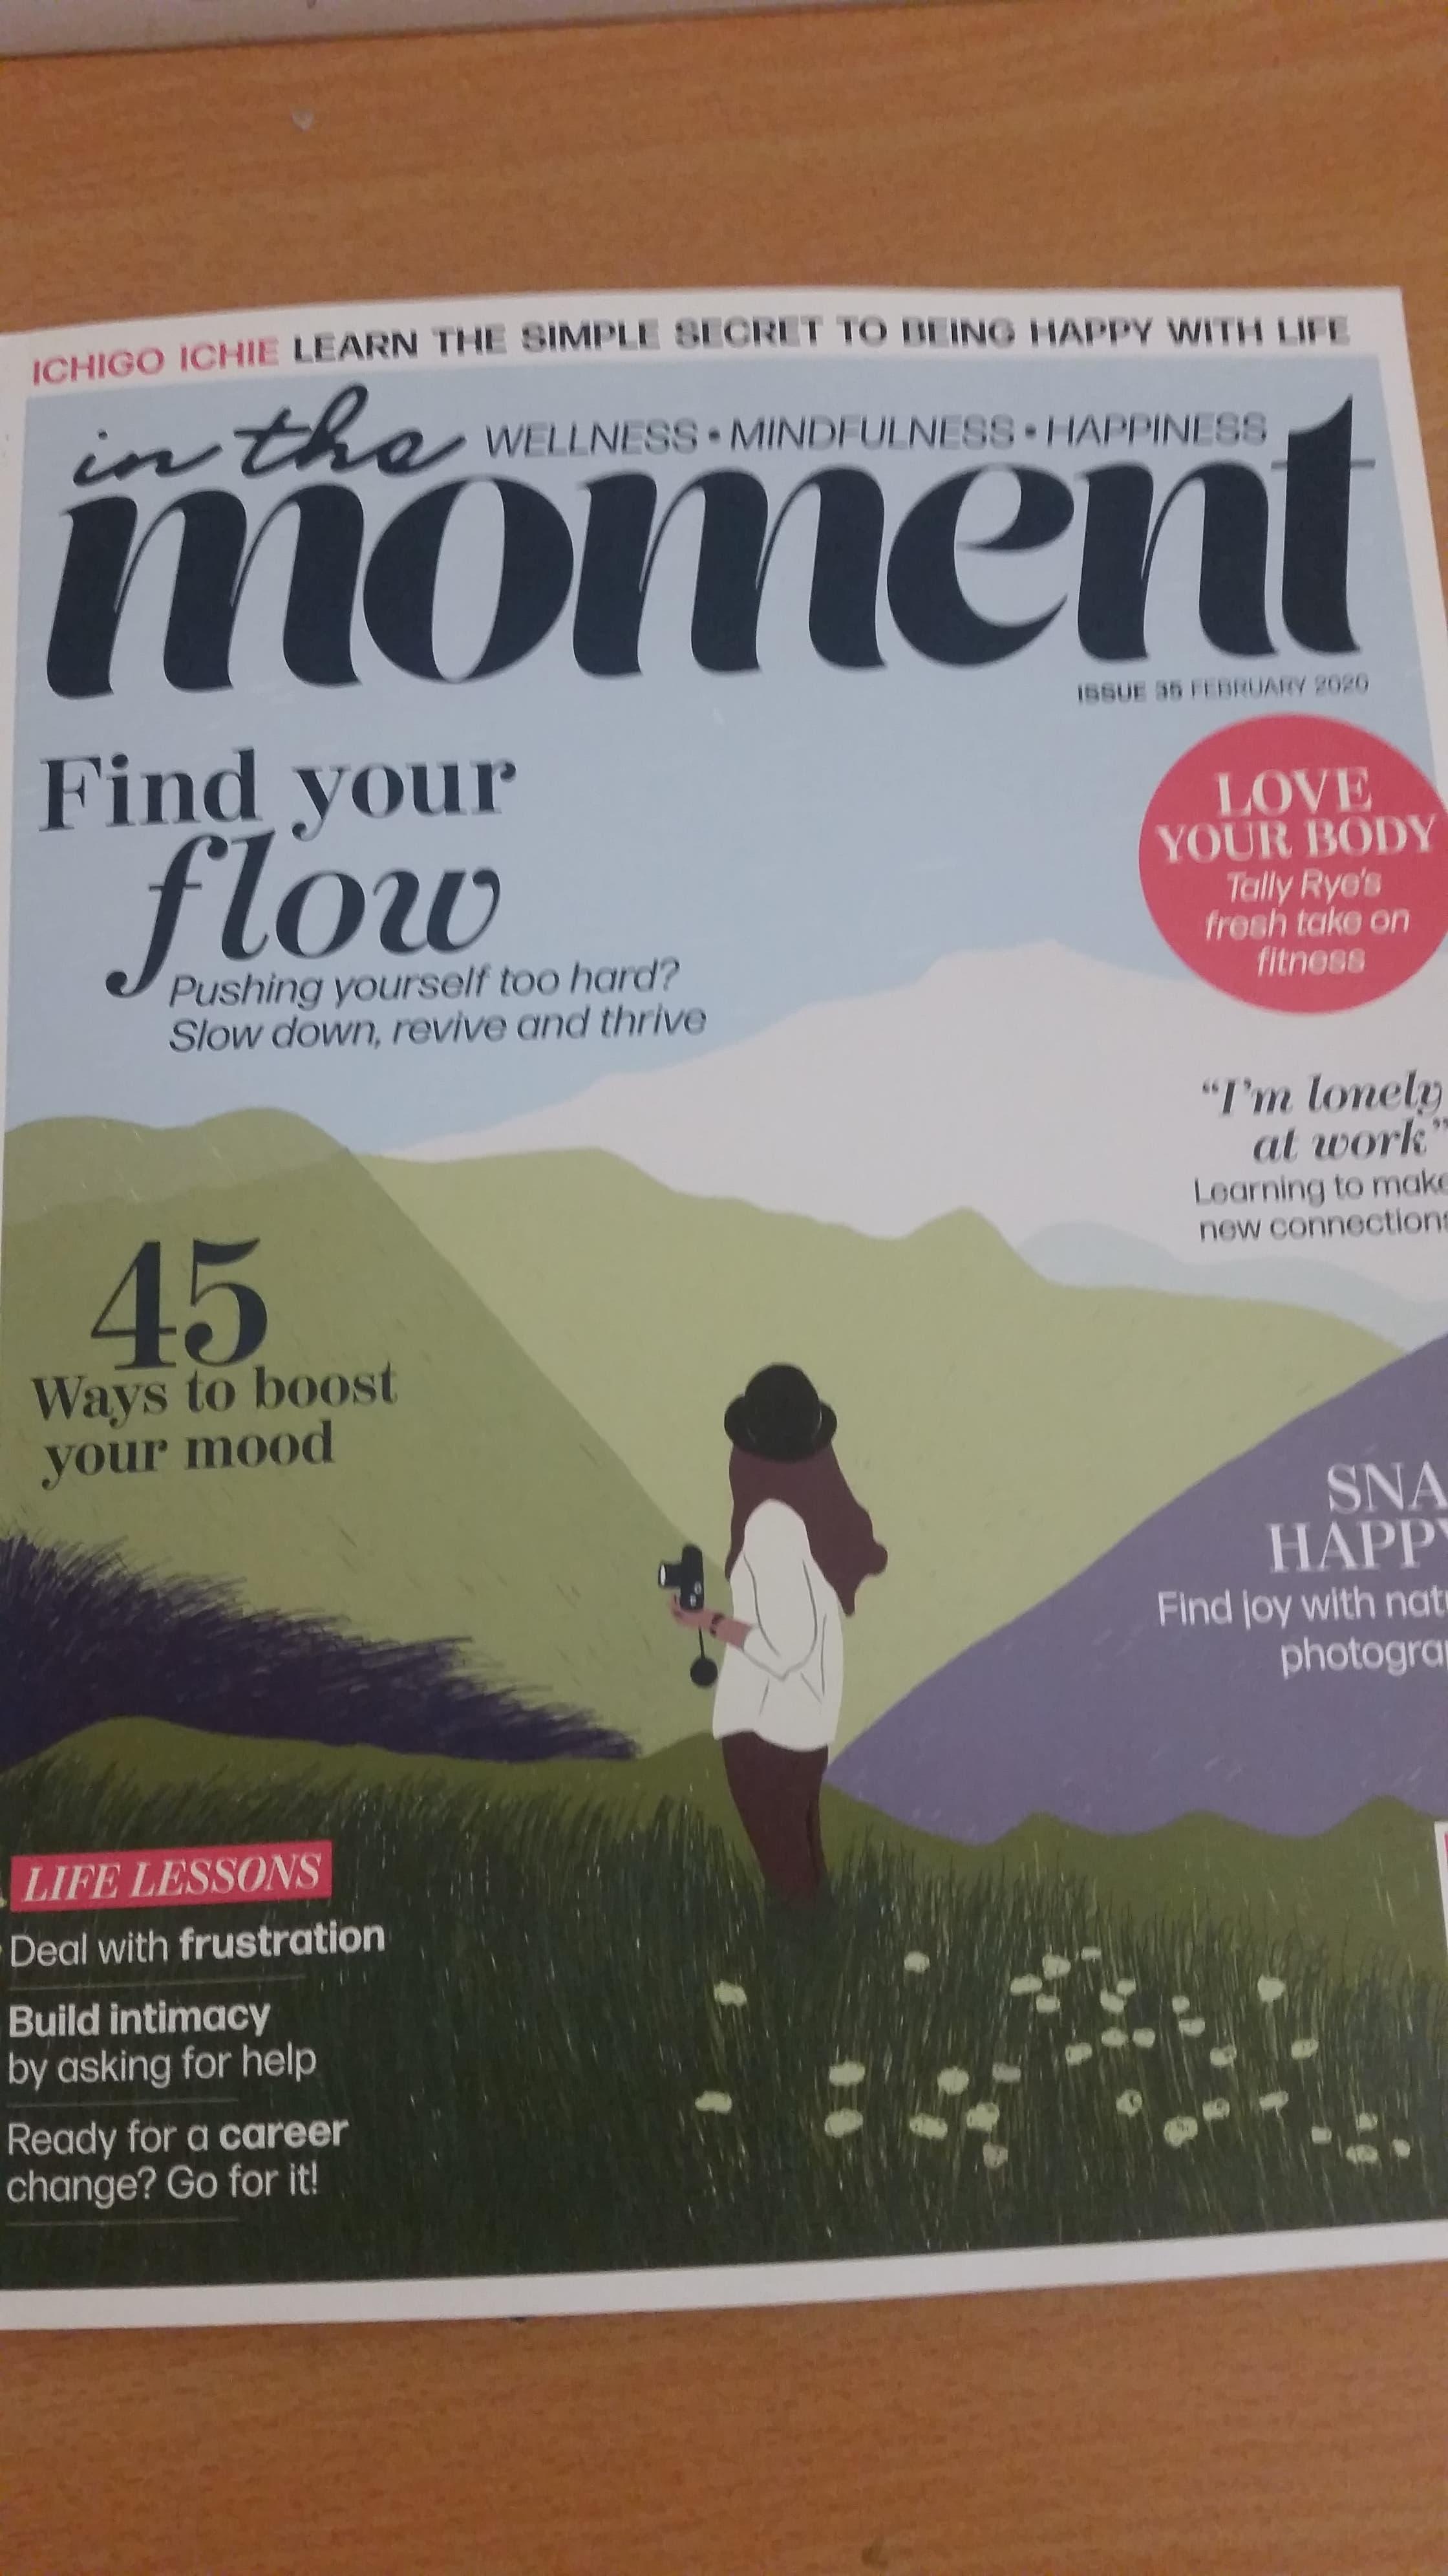 ITM magazine